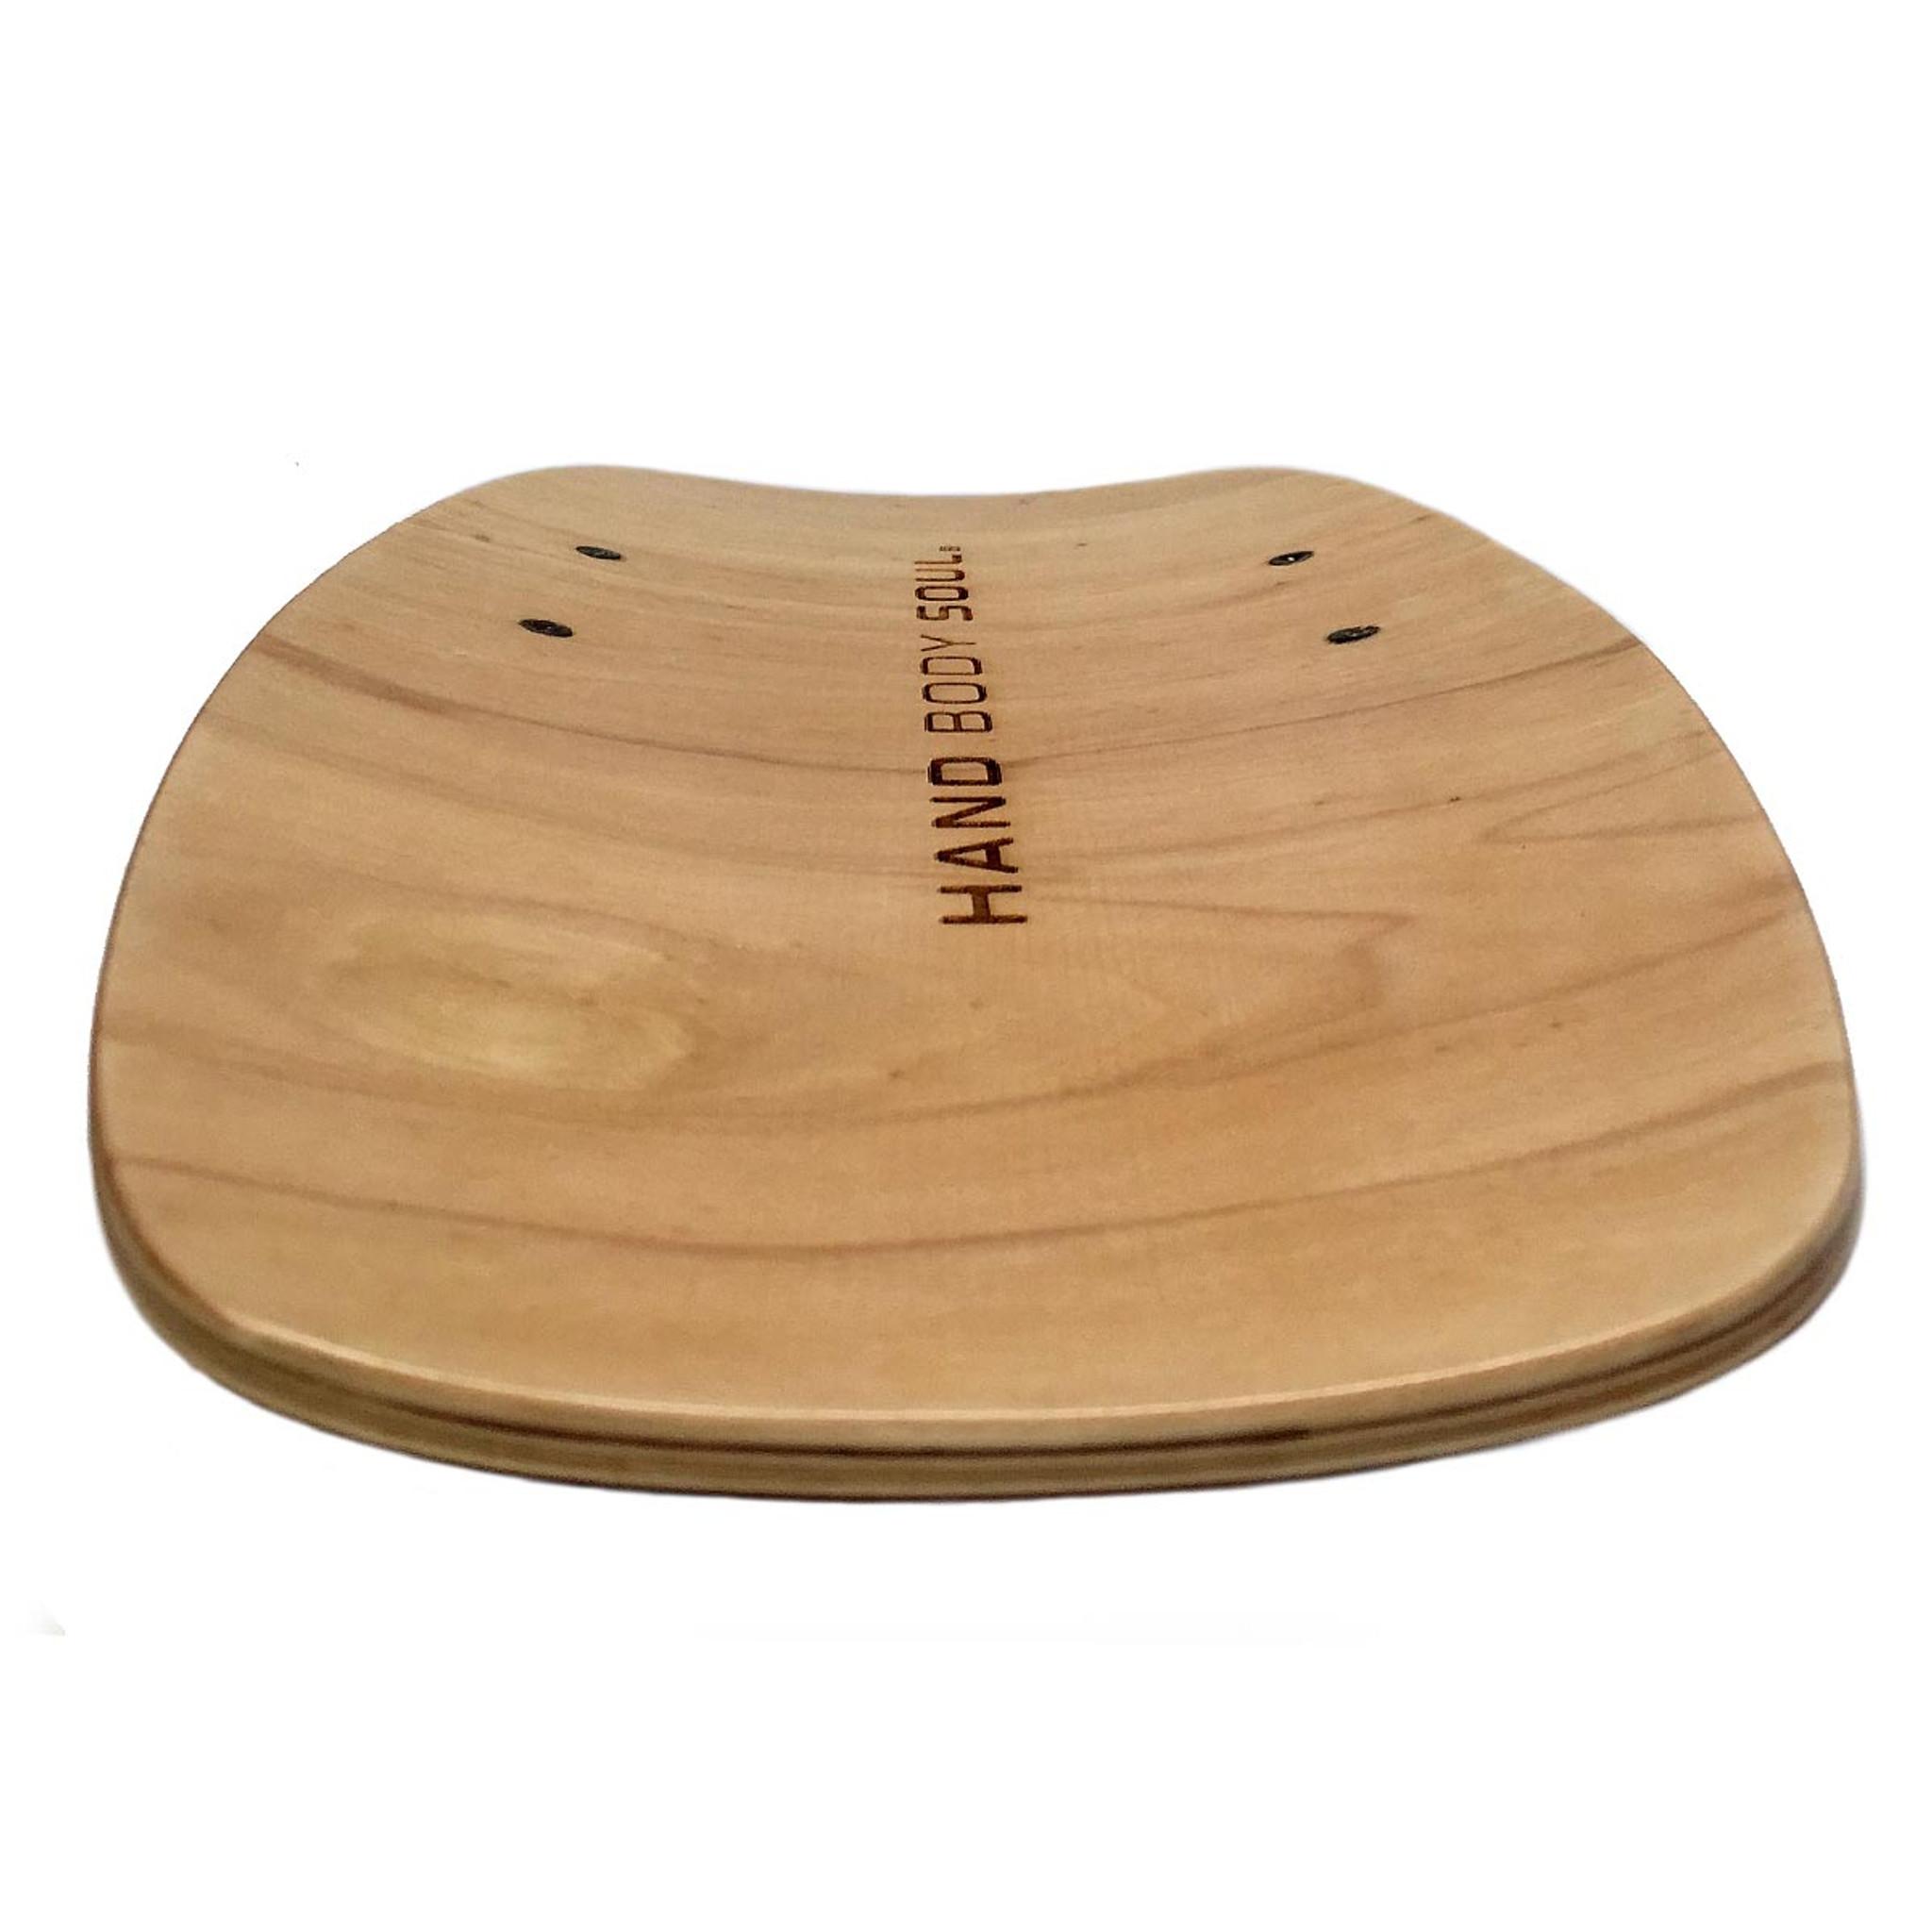 Value Bodysurfing Gear - Wood Handboard PF1s Socks Savers